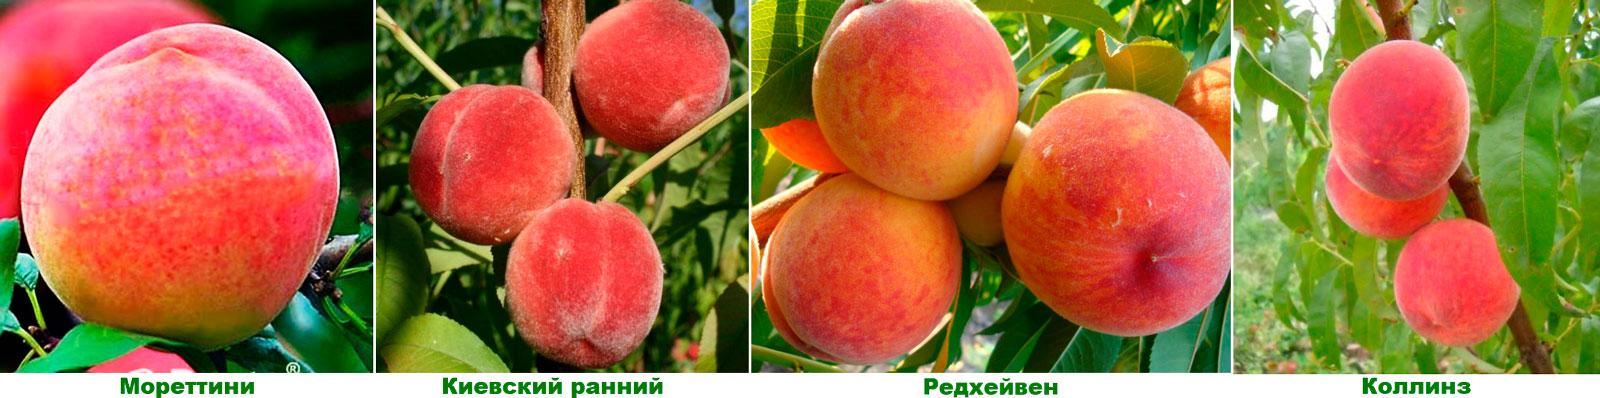 Персик: посадка, уход и обрезка